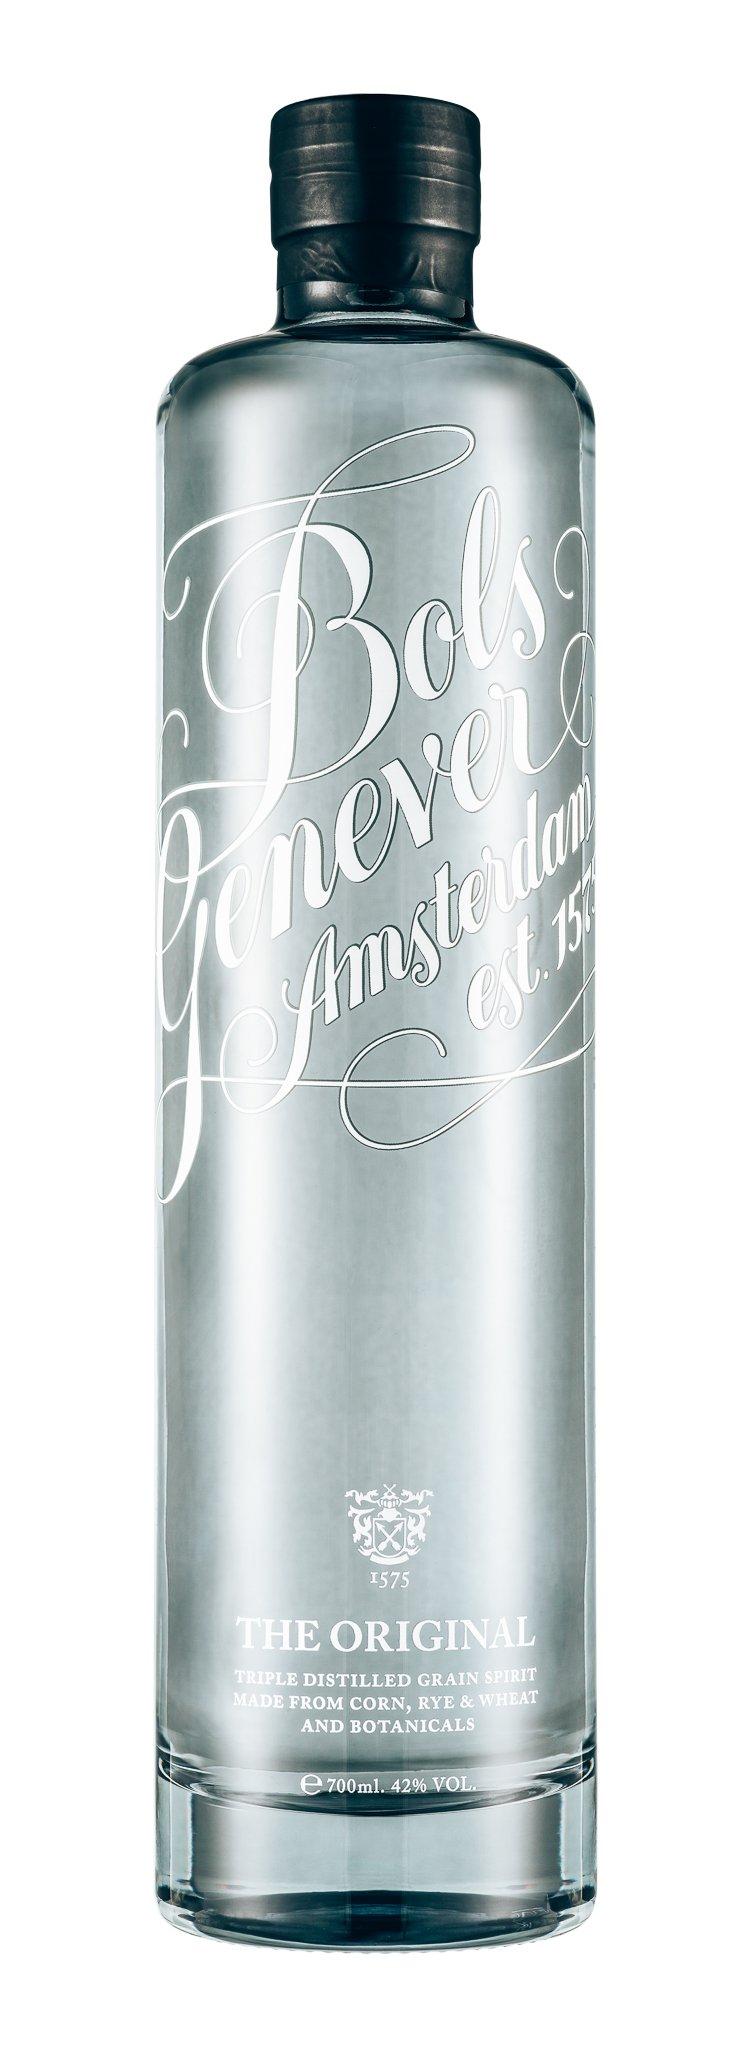 Bols Genever Original, Lucas Bols, Alles over gin.